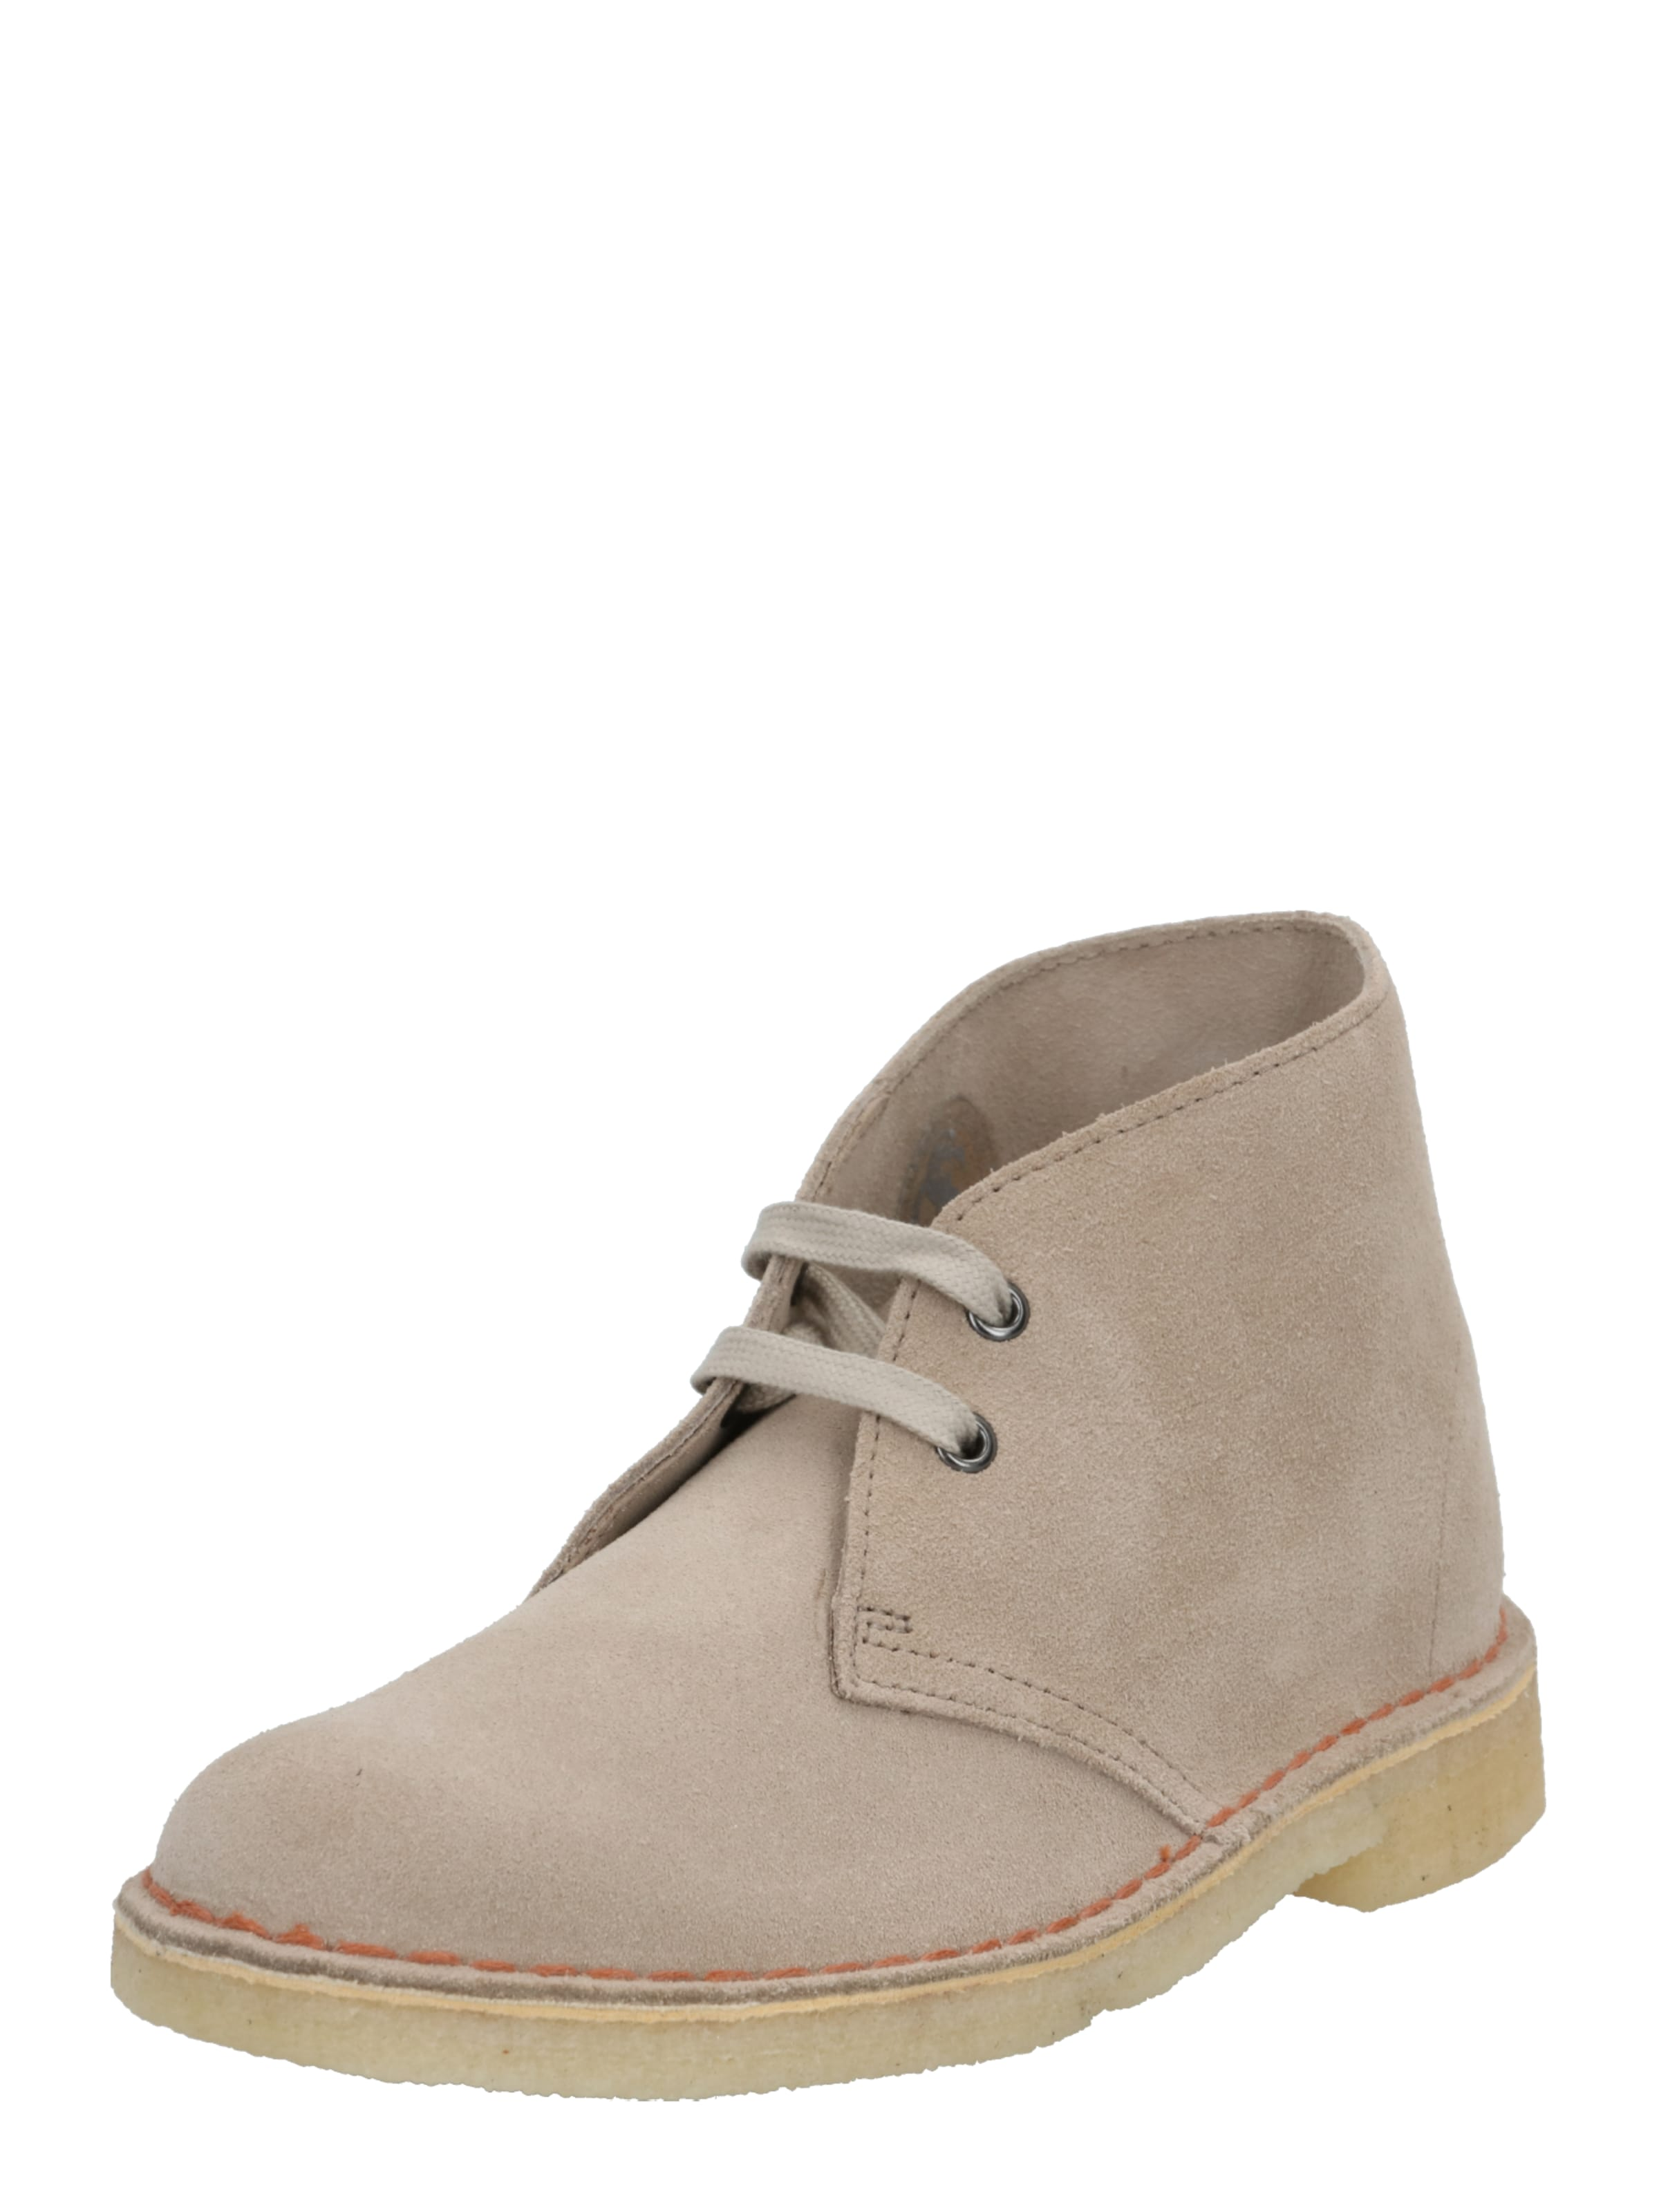 Clarks Originals Fűzős cipő 'Desert Boot' homok színben